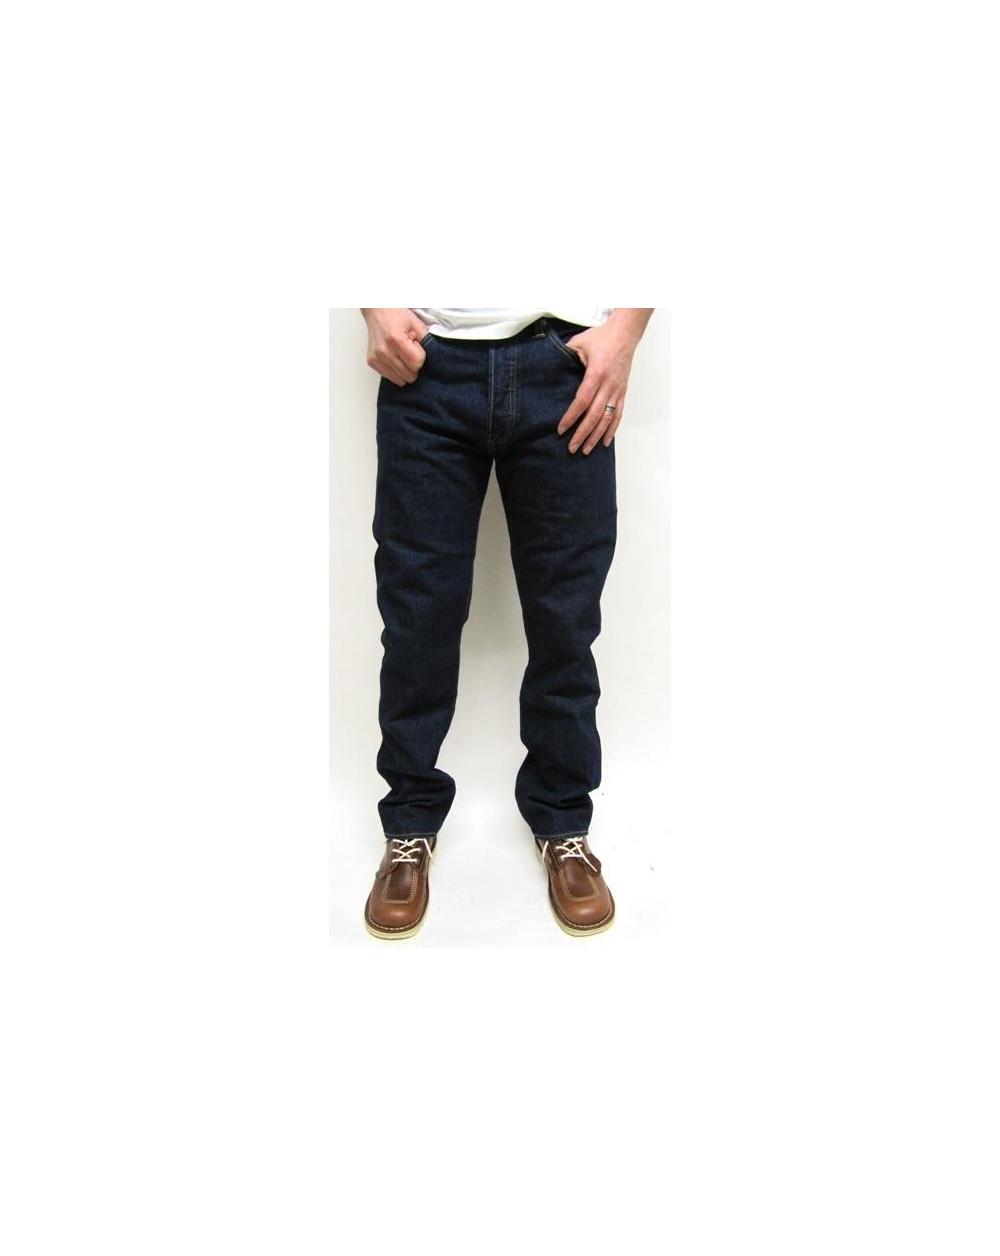 levis 501 classic jeans indigo wash levis 501 classic jeans. Black Bedroom Furniture Sets. Home Design Ideas